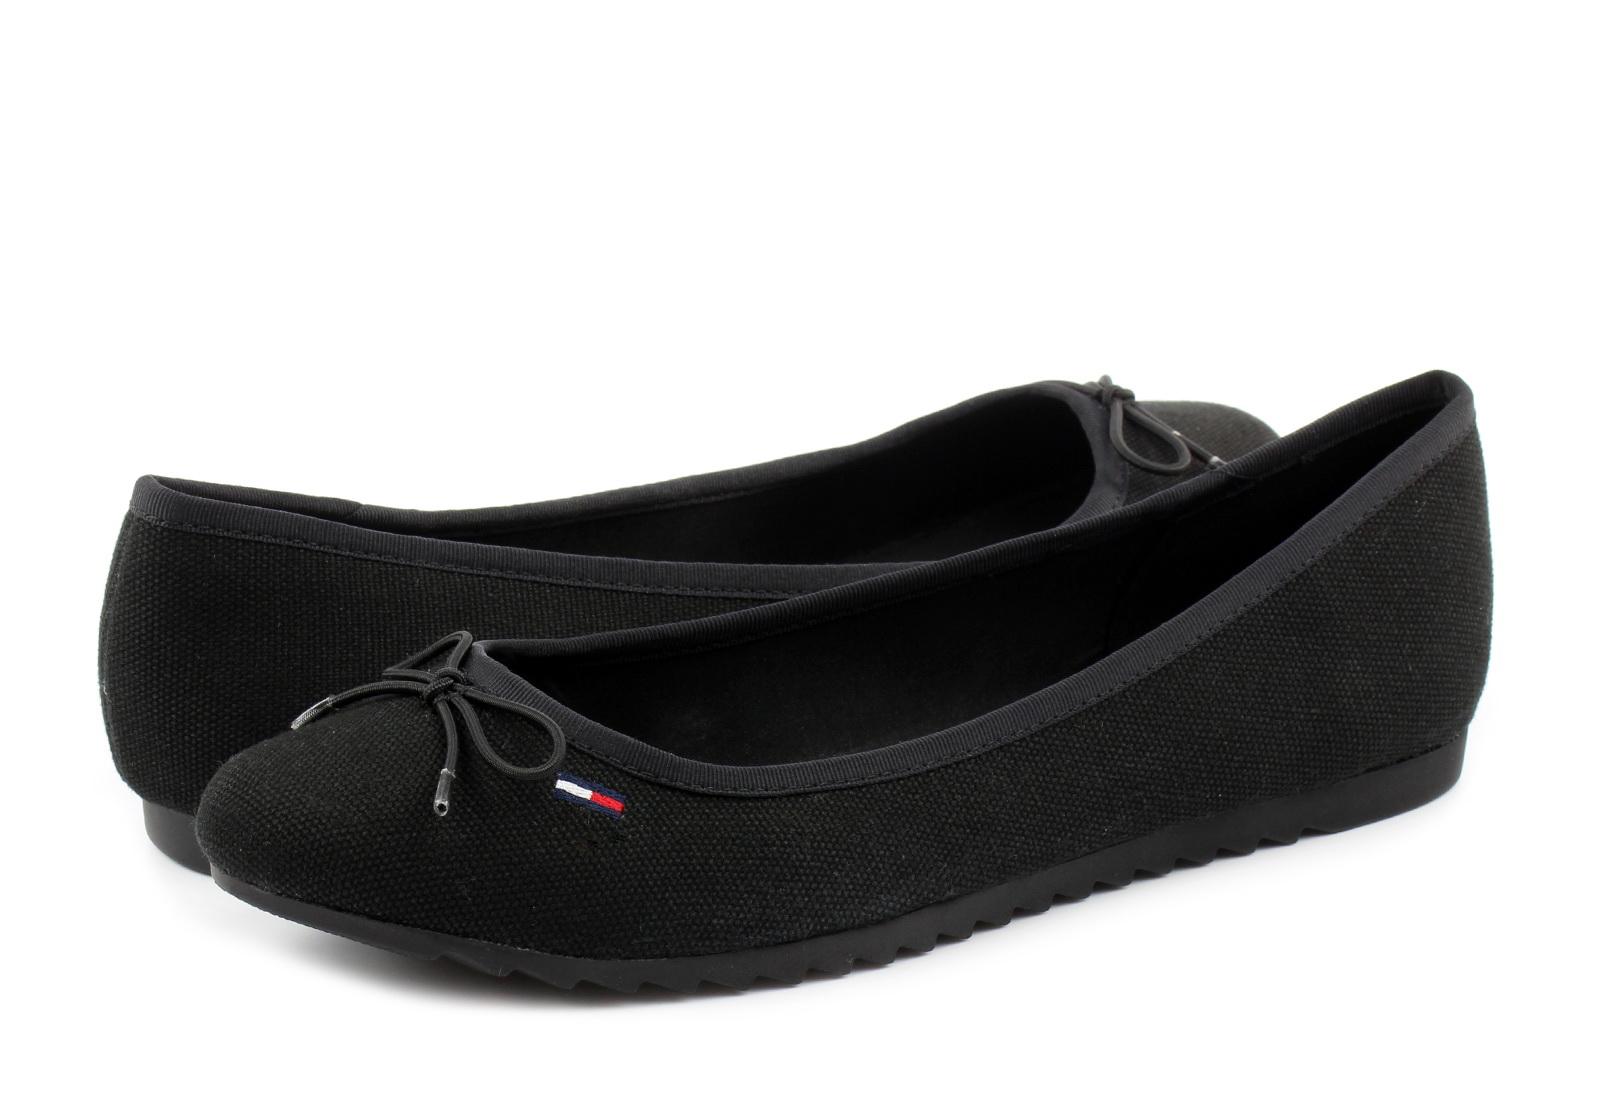 Tommy Hilfiger Baleriny Melissa 7d2 En0 0818 Bds Obuwie I Buty Damskie Meskie Dzieciece W Office Shoes